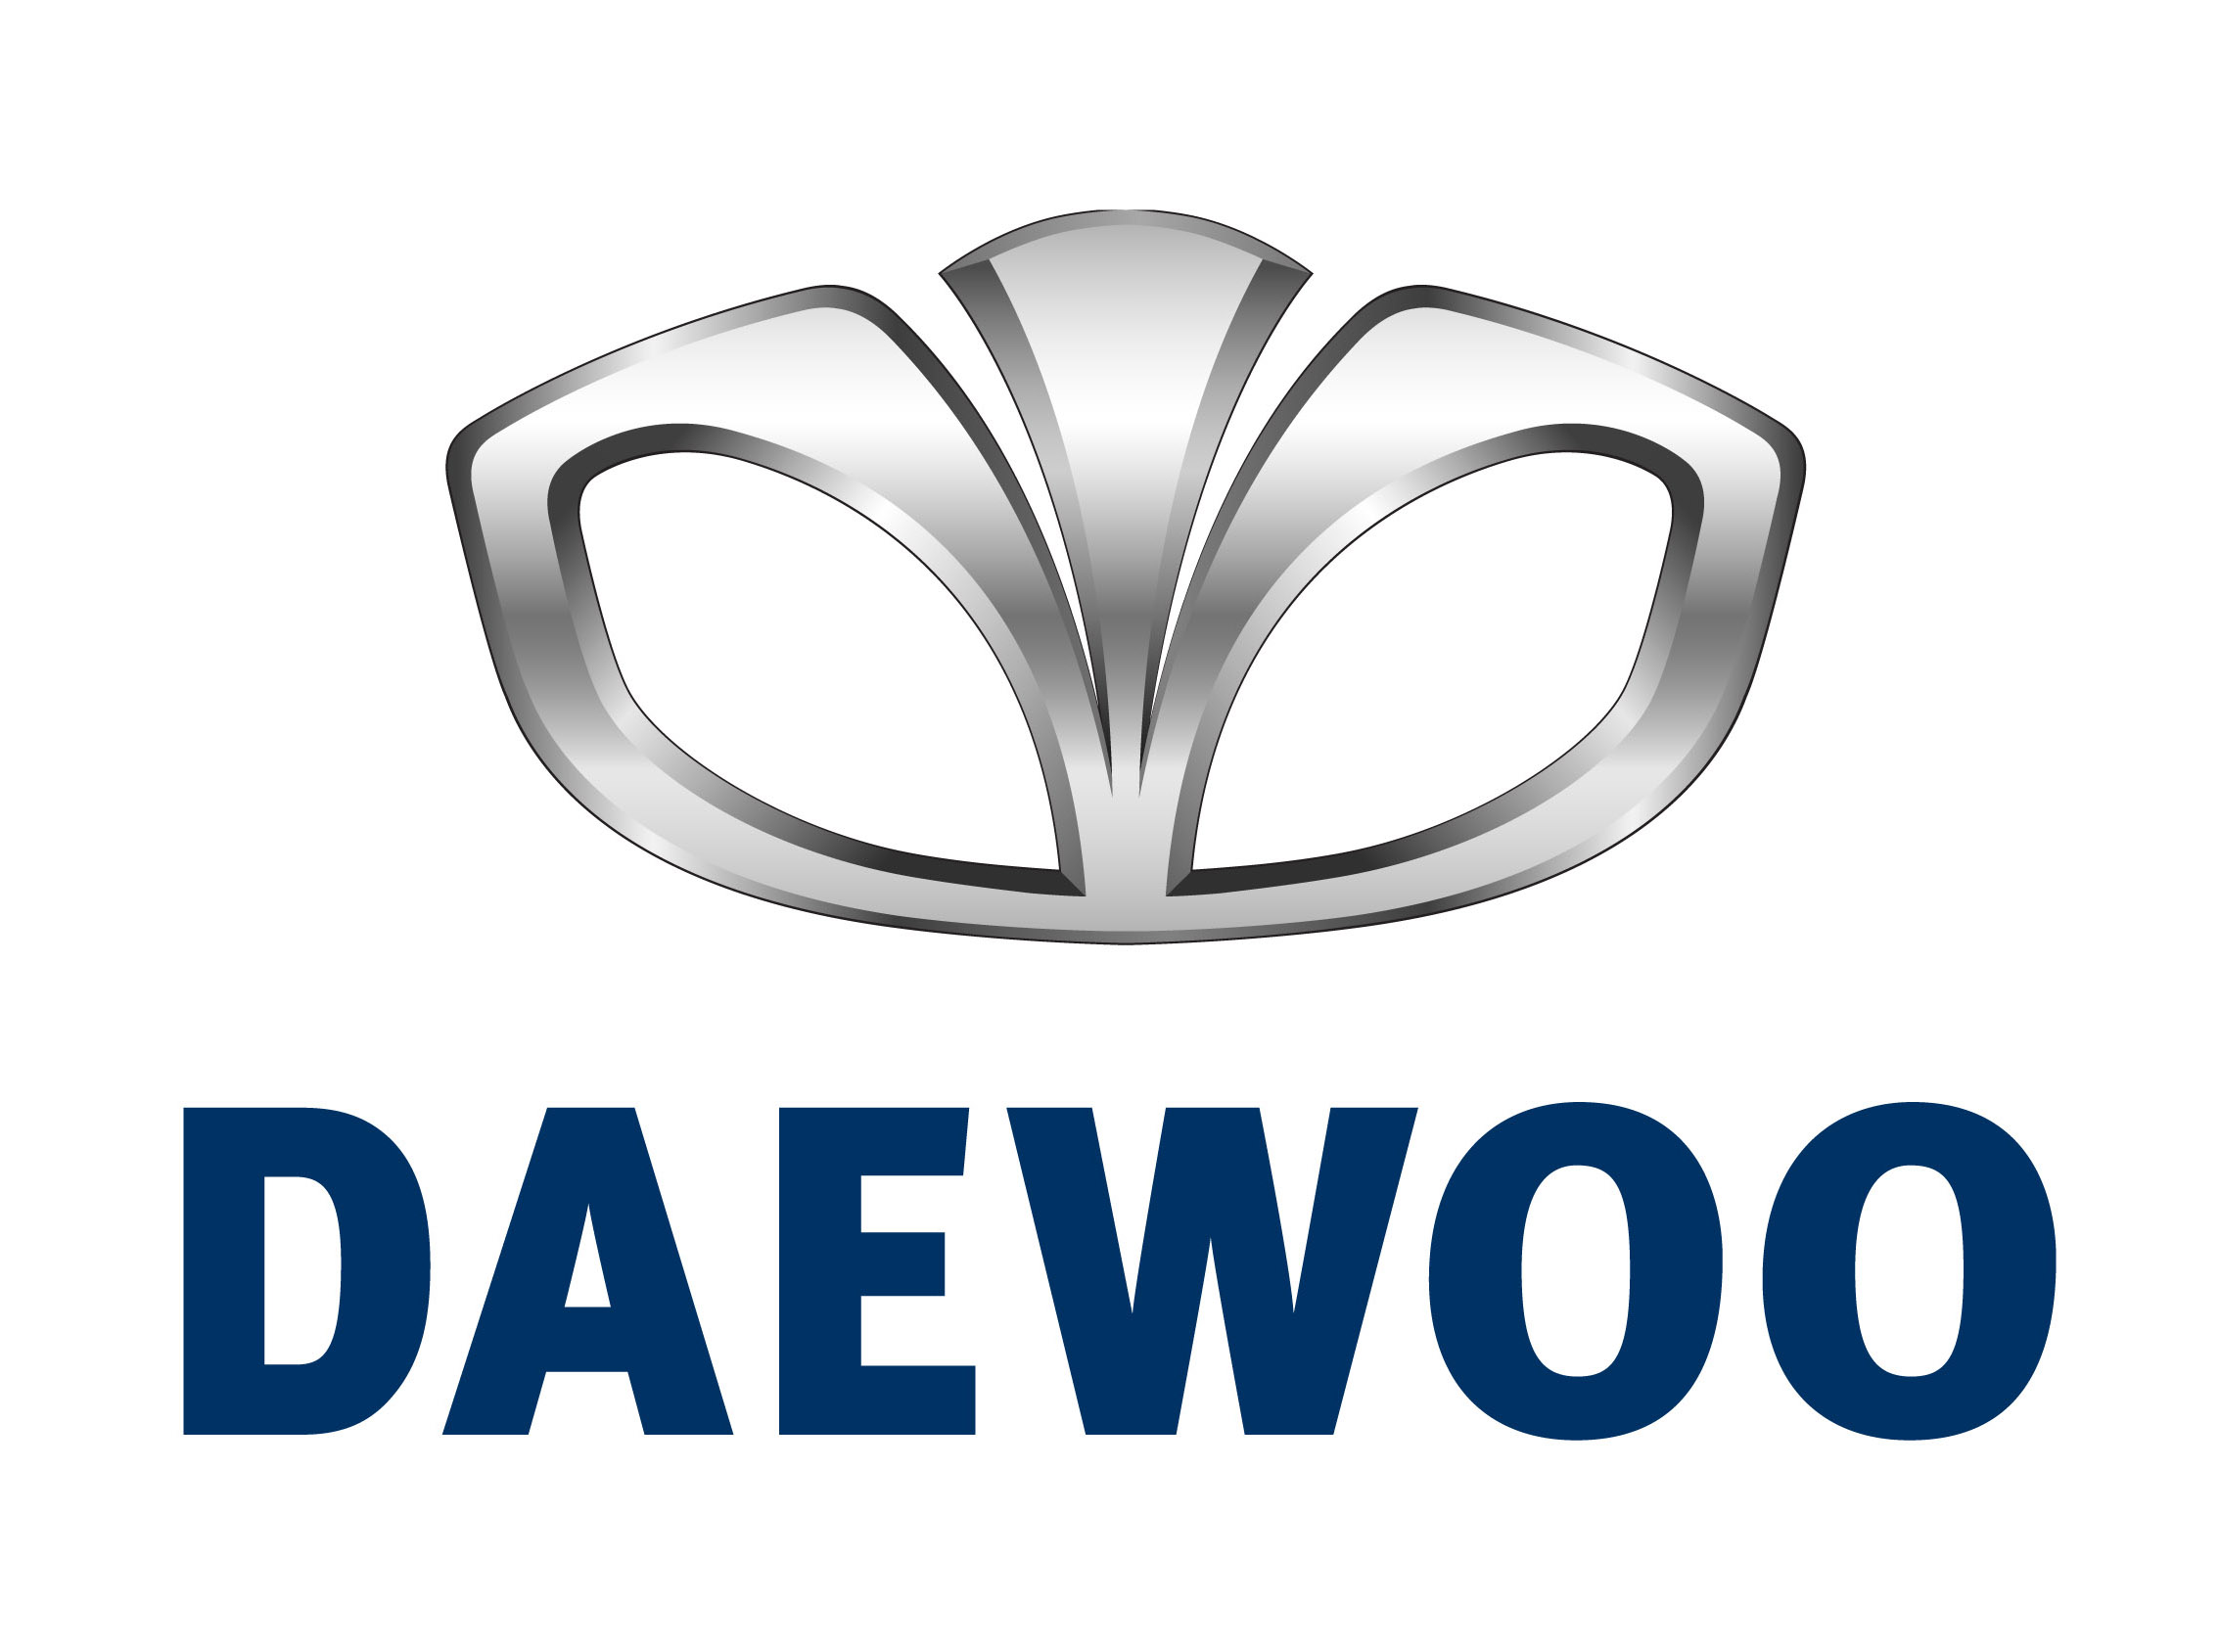 Daewoo-auto-logo